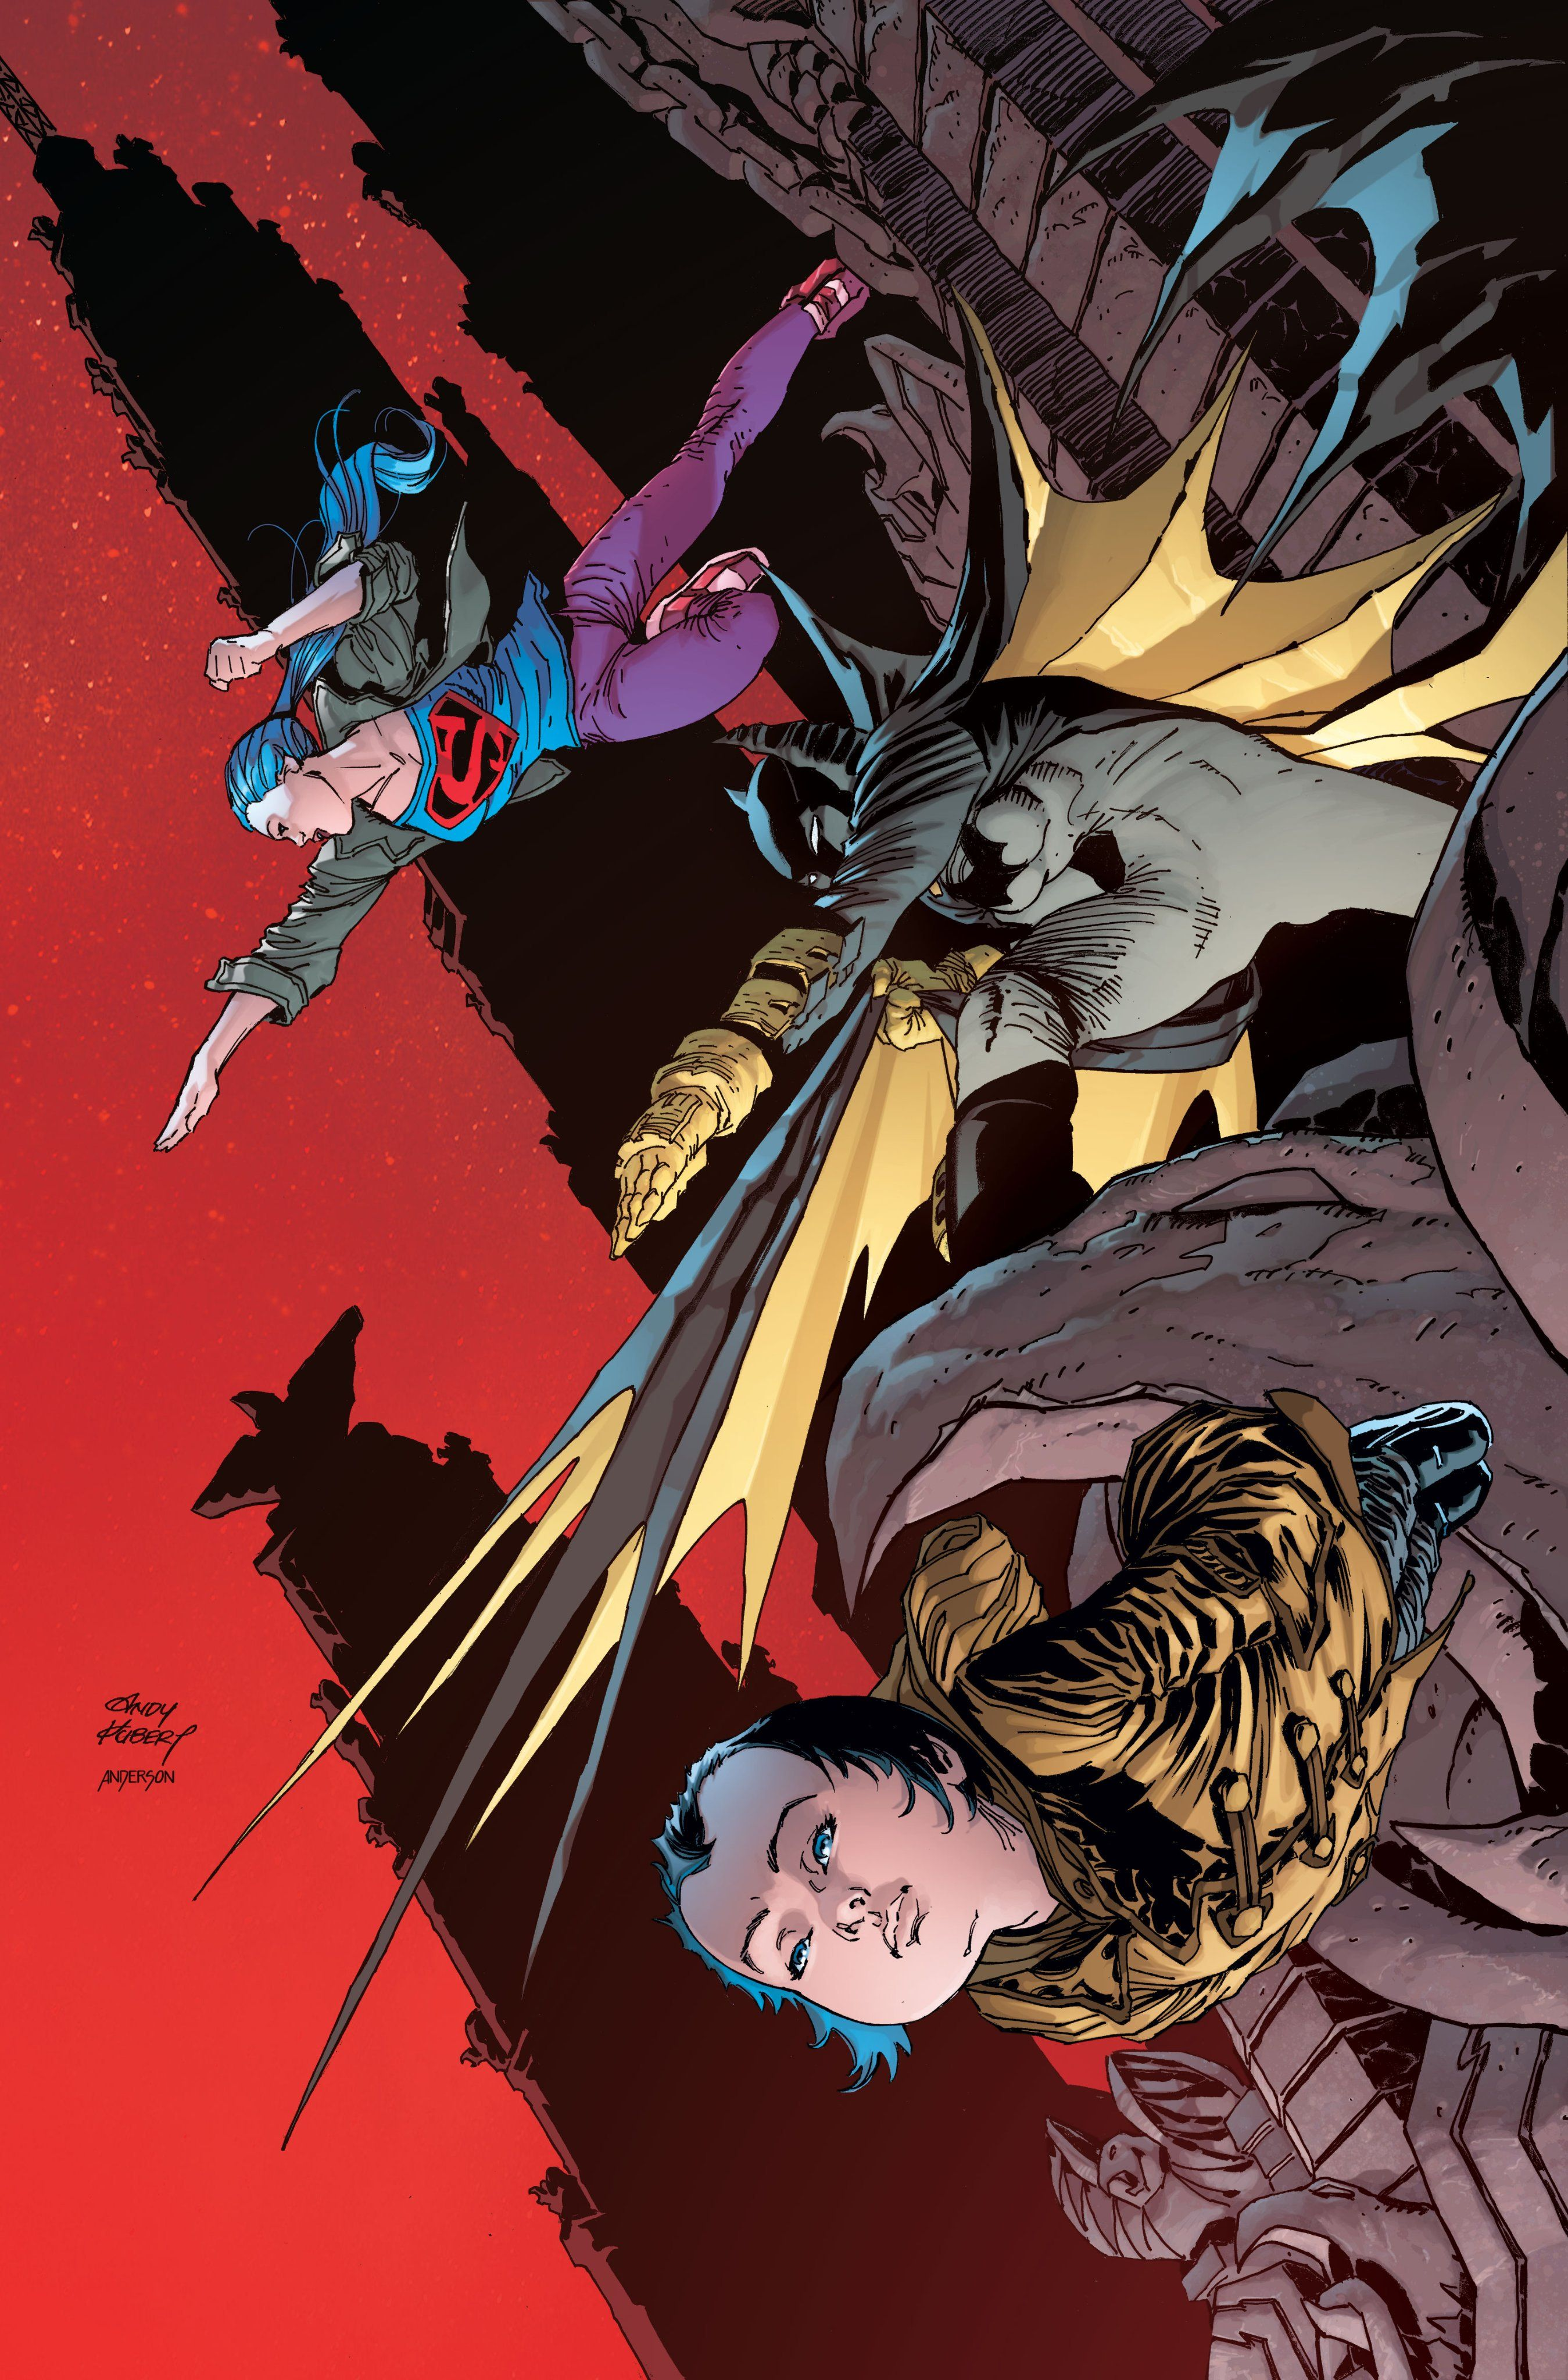 Pin By Jesus Nunez Leal On Magik And Tecnology Dark Knight Returns Golden Child Dark Knight